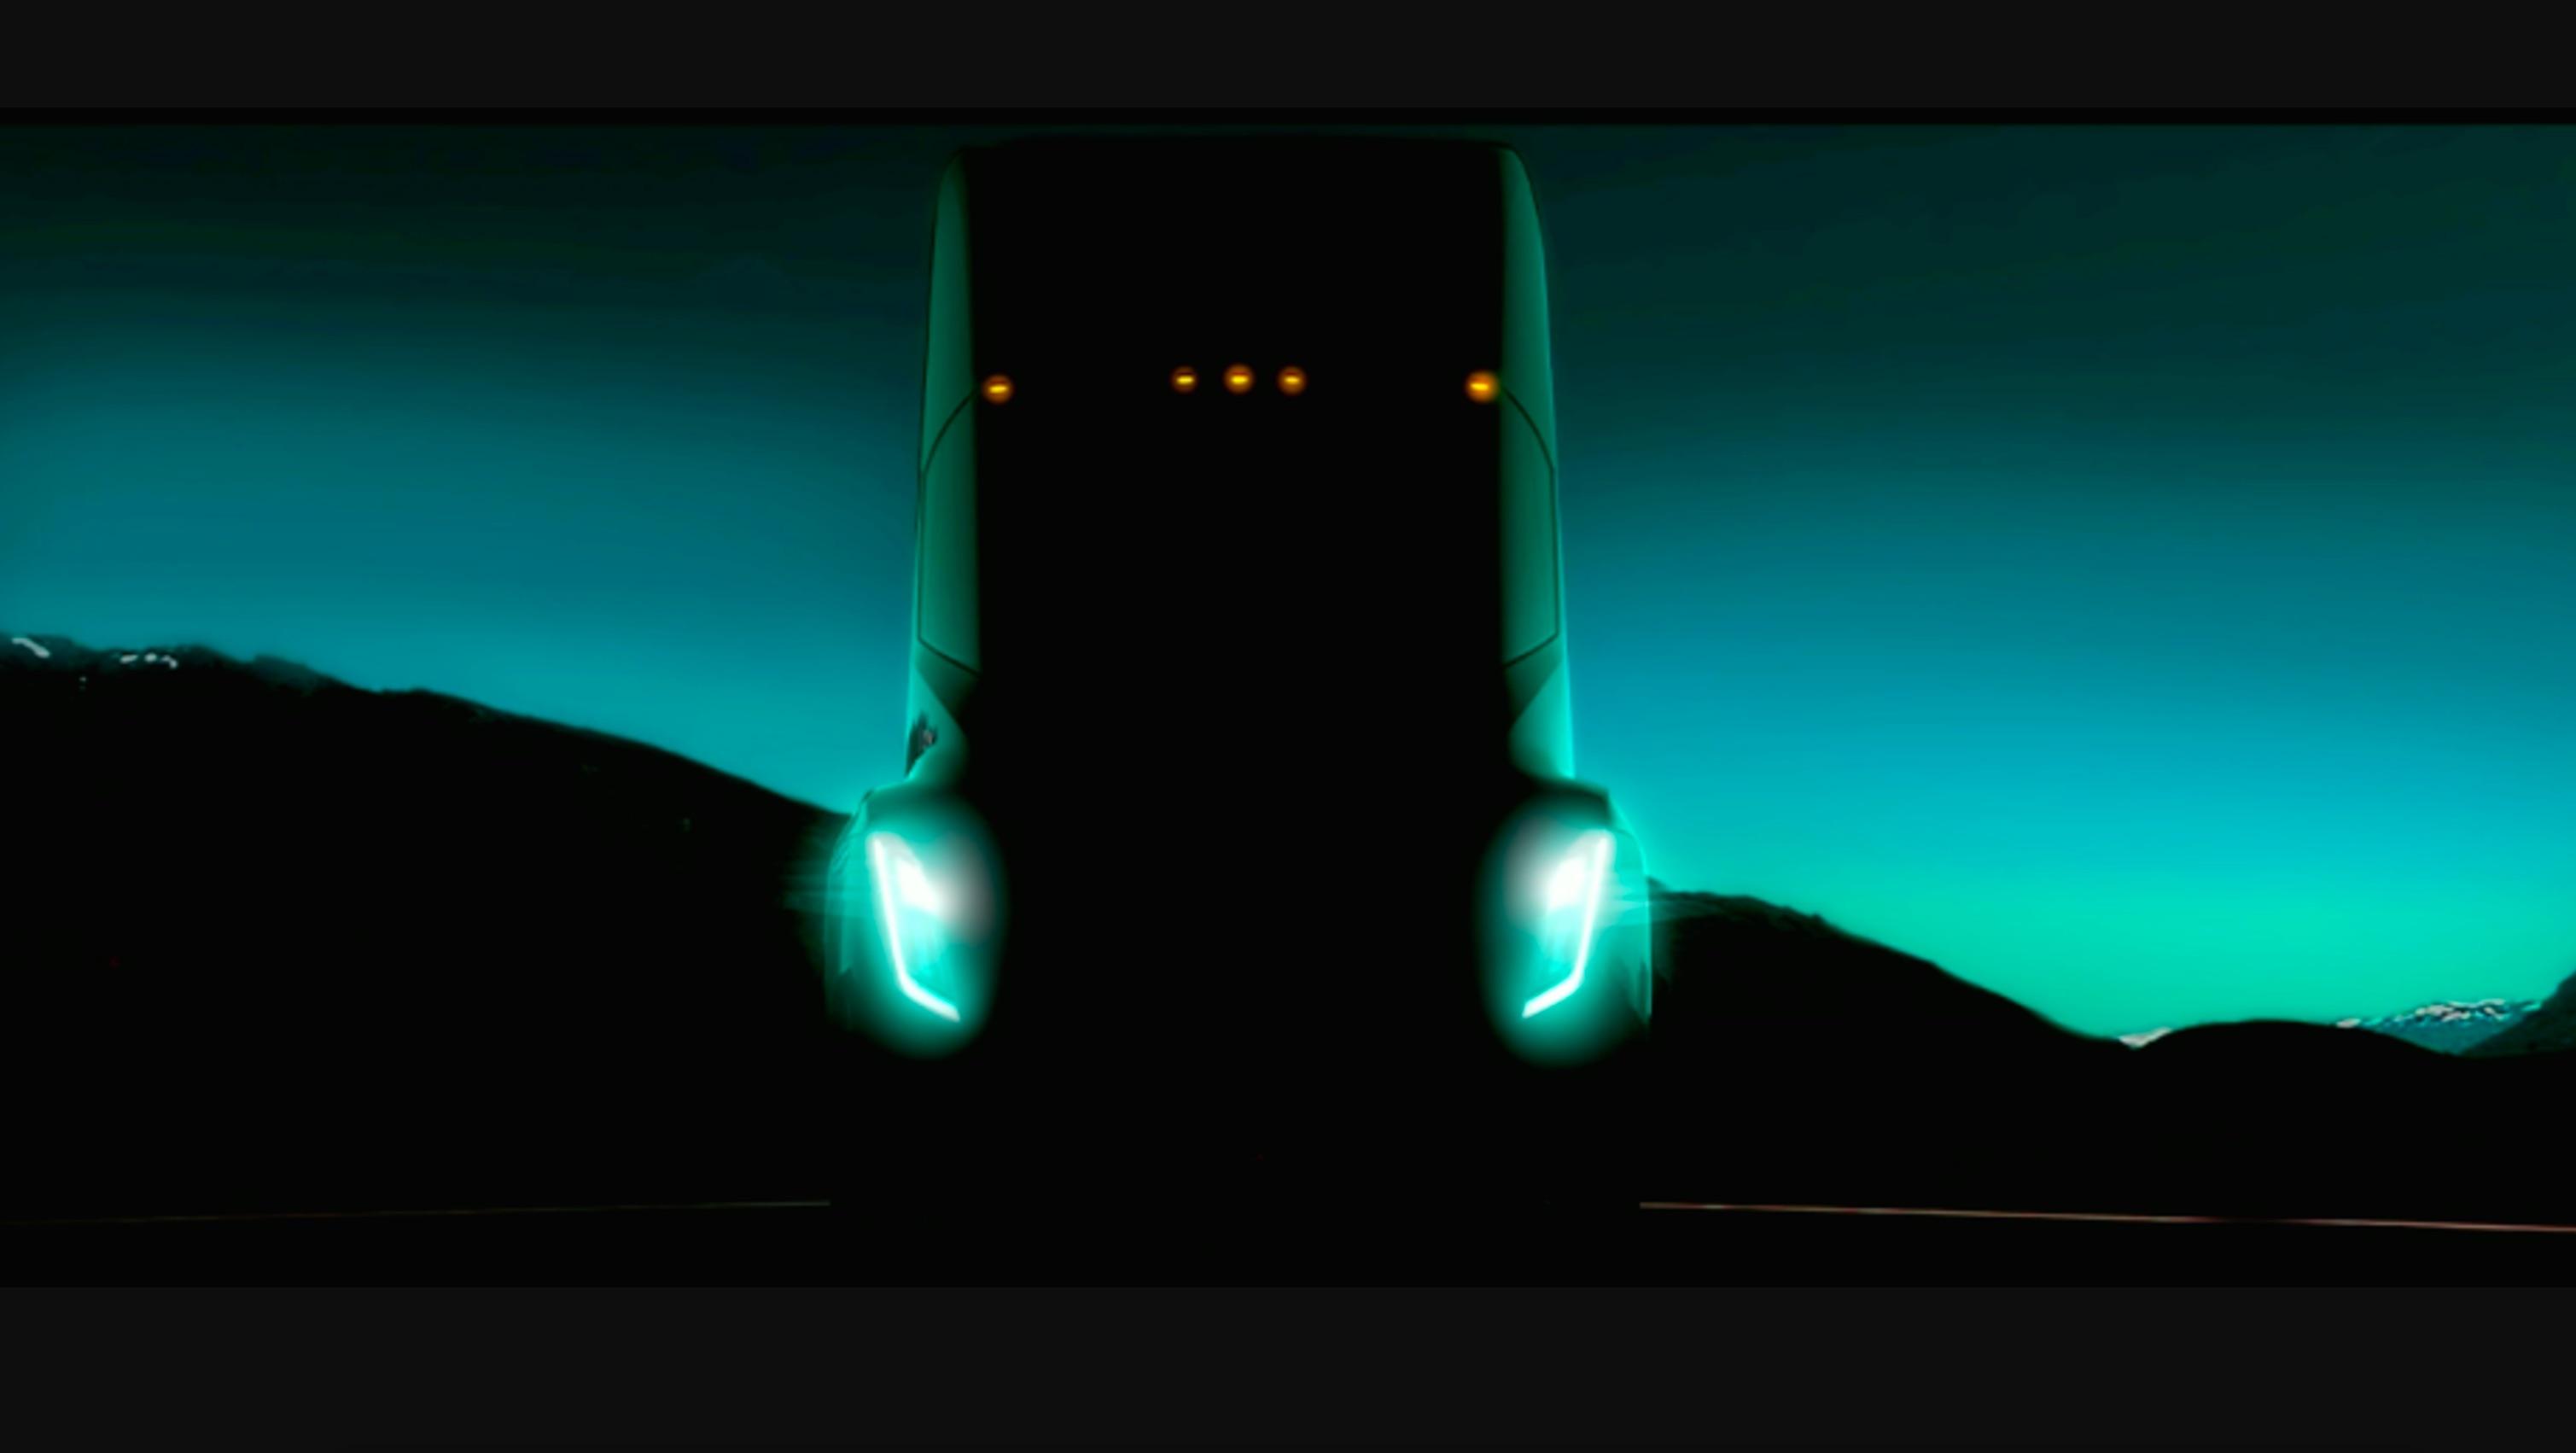 Вweb-сети появилось видео разгона электрогрузовика Tesla Semi